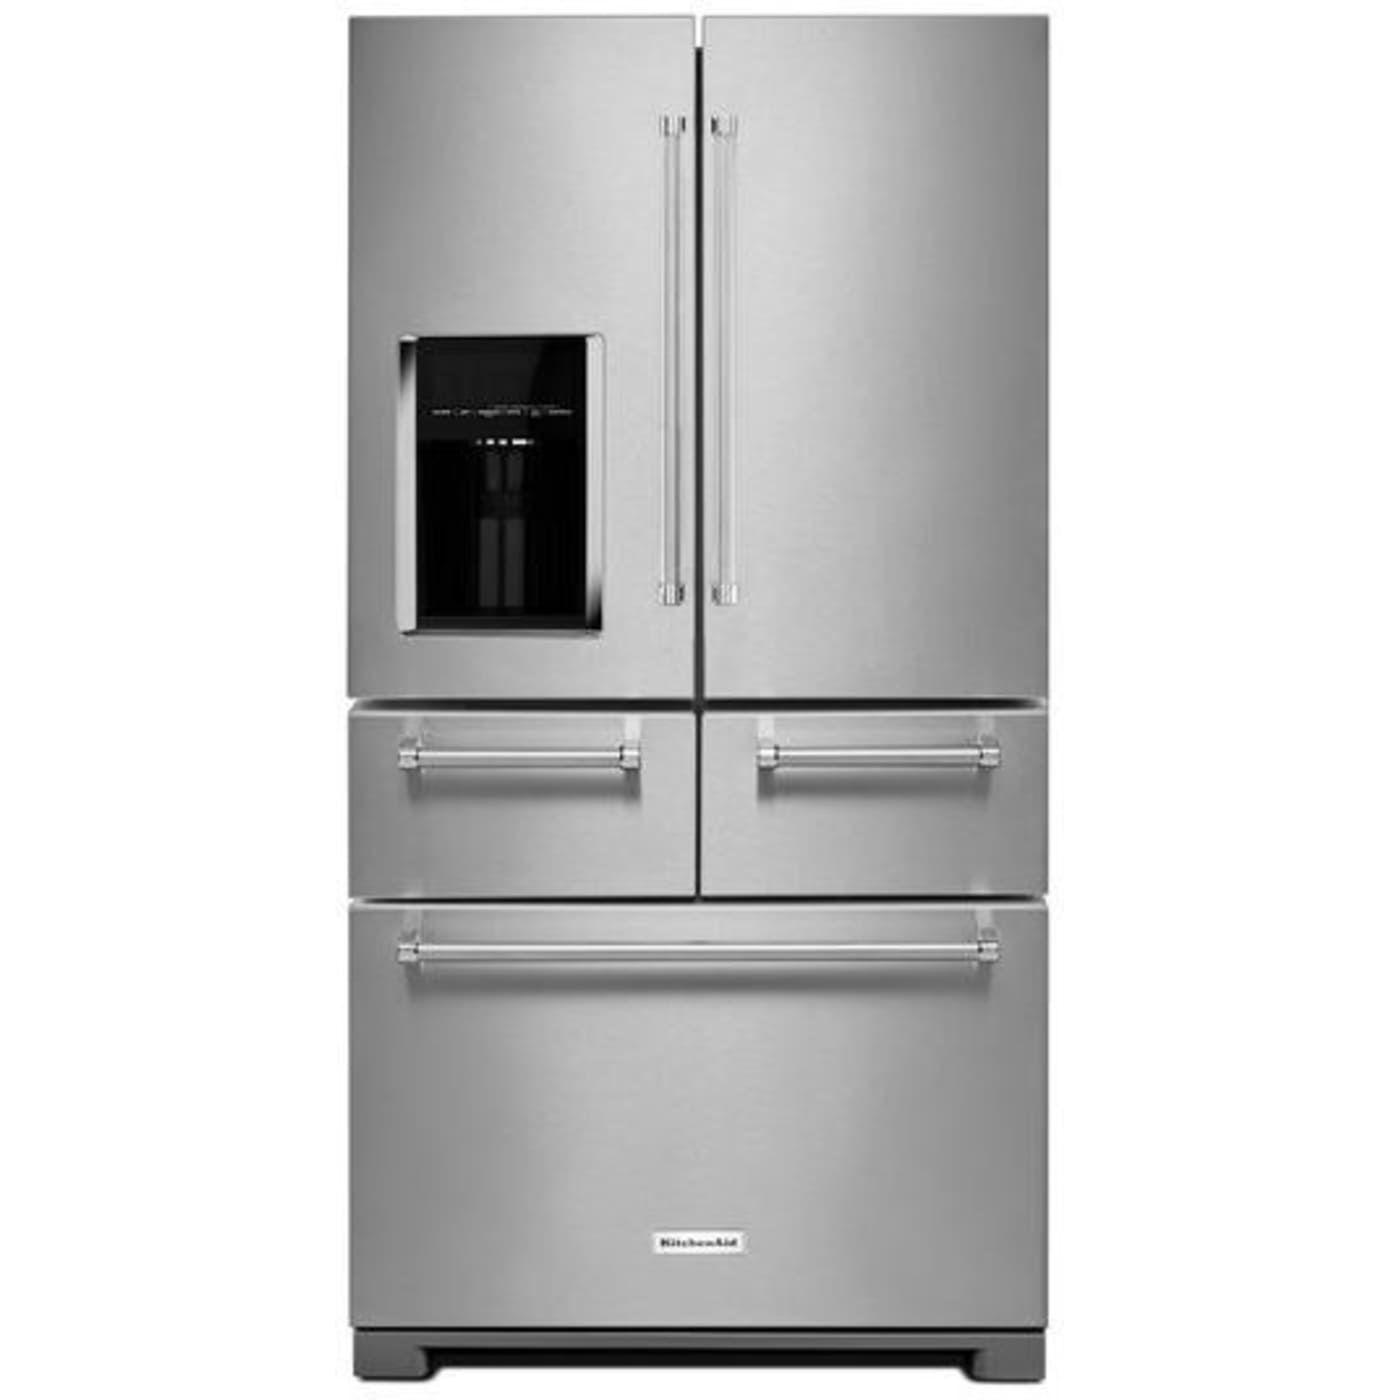 Krmf706ess by kitchenaid french door refrigerators